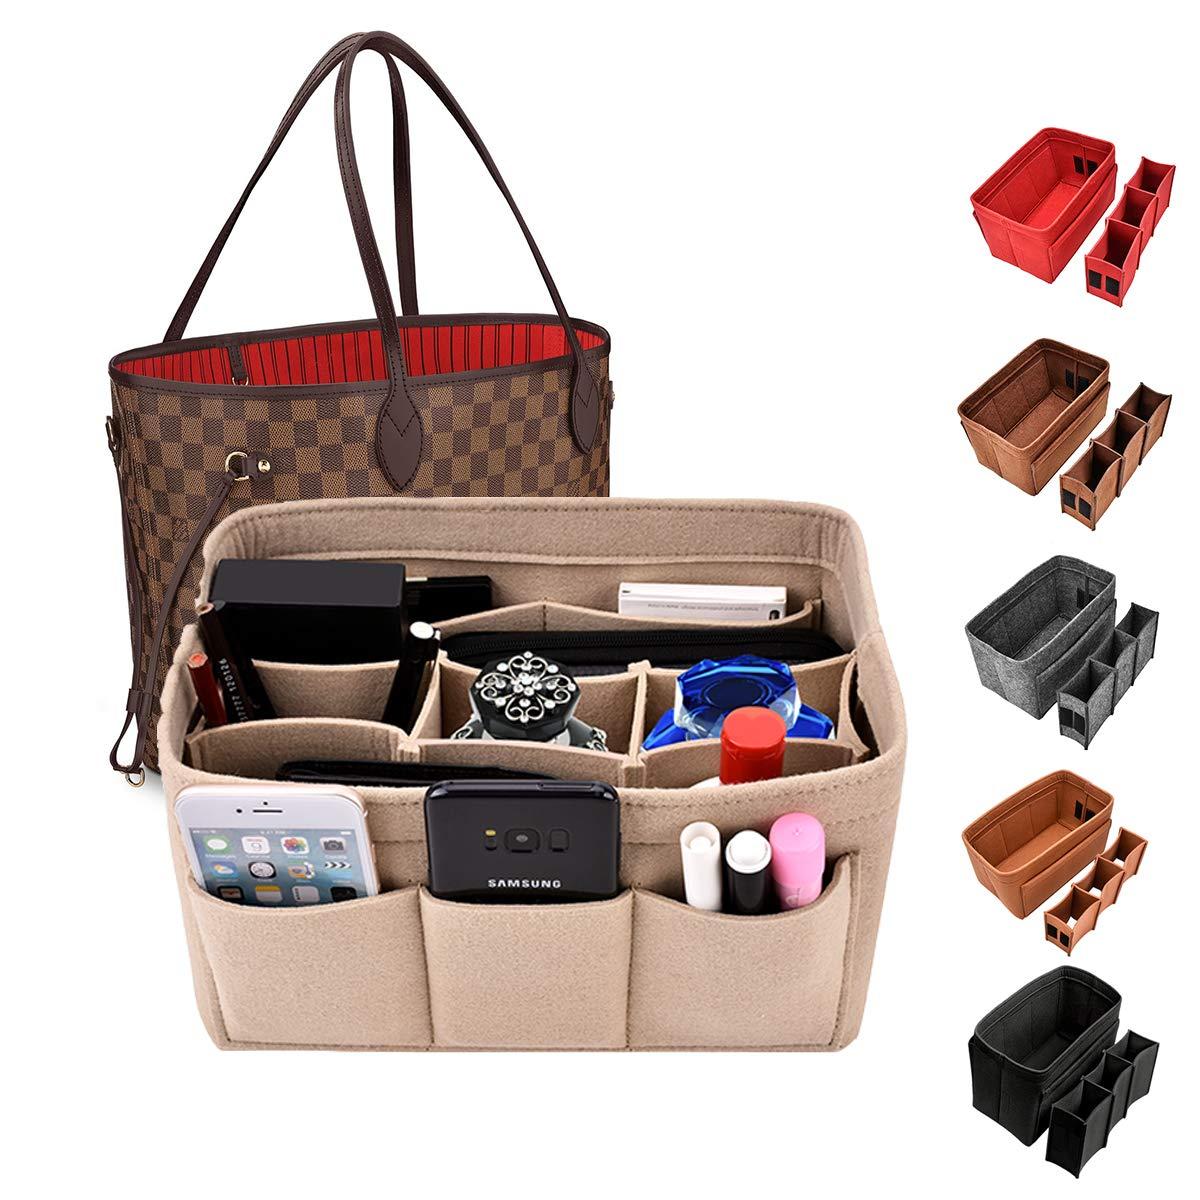 Kumako Handbag Organizer Bag In Bag For Felt Insert Purse Organizer Insert Bag Felt Fabric Purse Organizer for Handbag Tote Bag(12Pockets,3color,Medium)